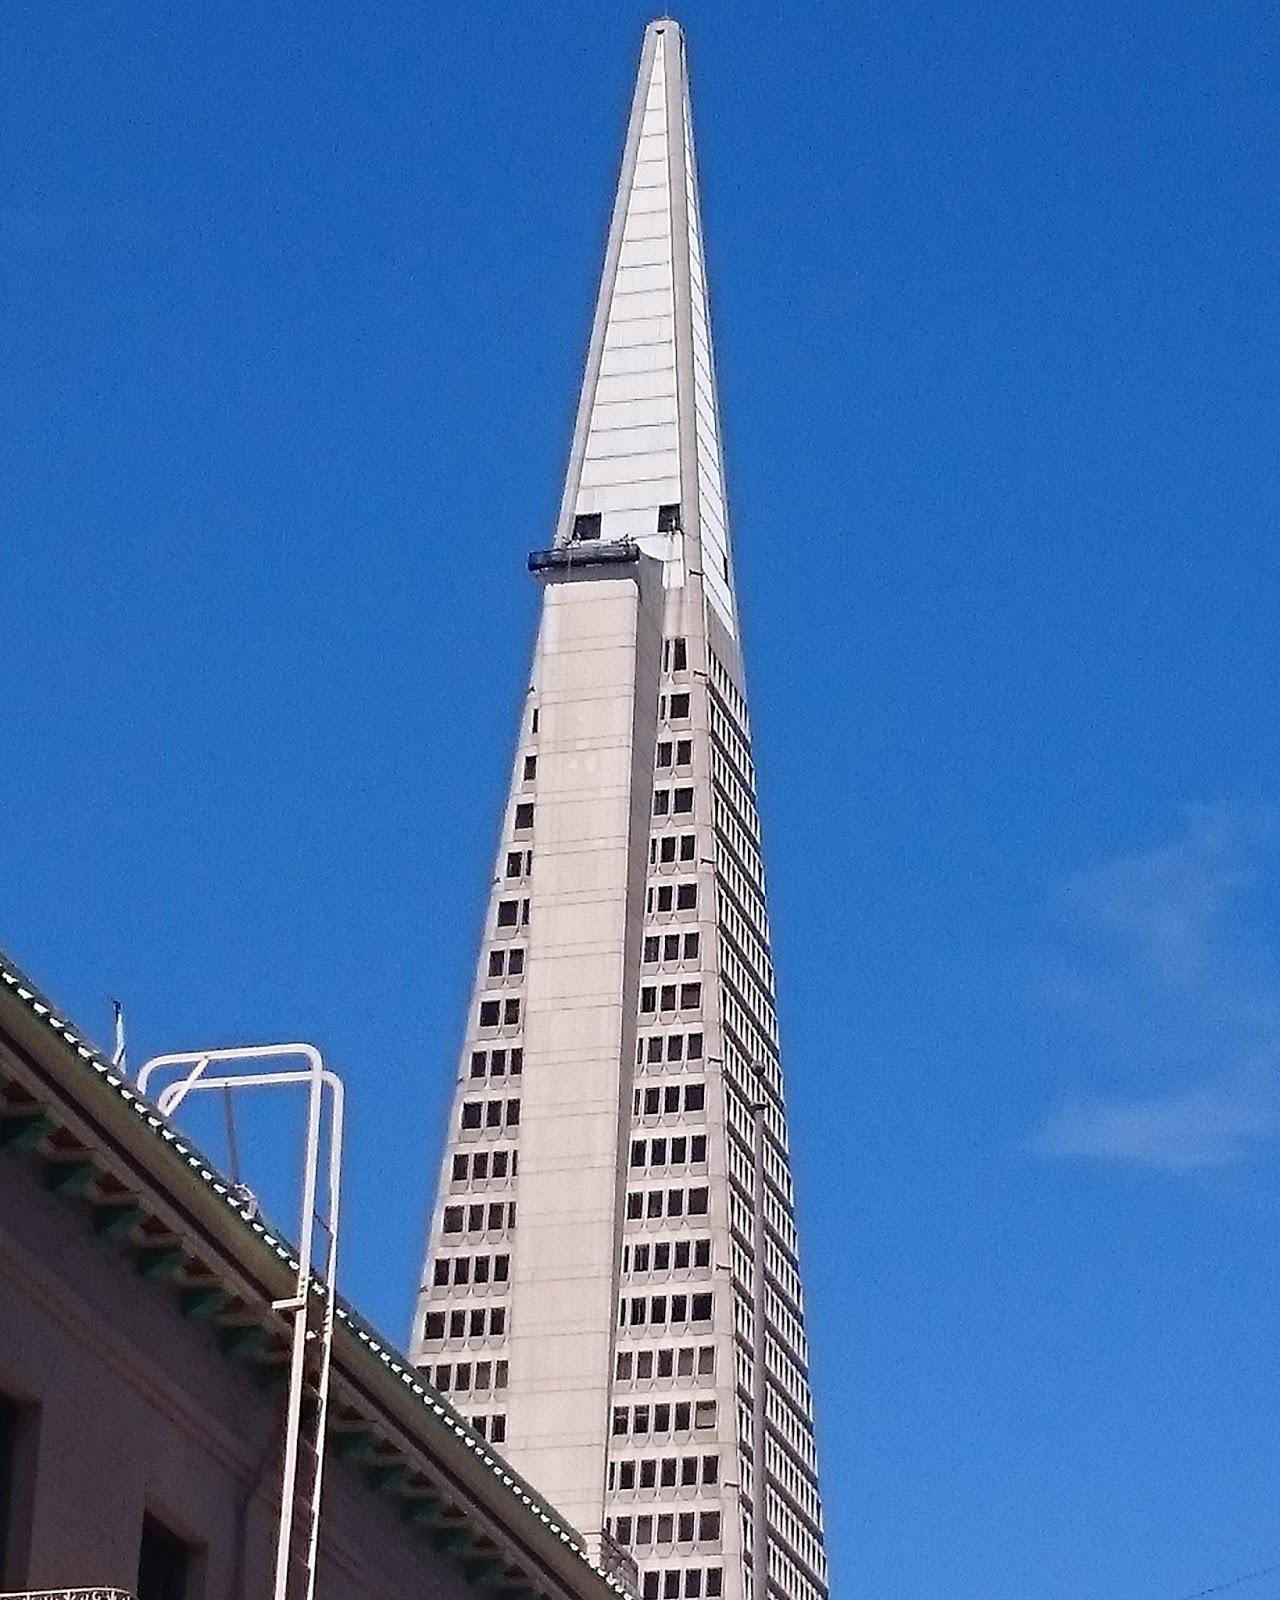 Upwards view of Transamerica Pyramid San Francisco